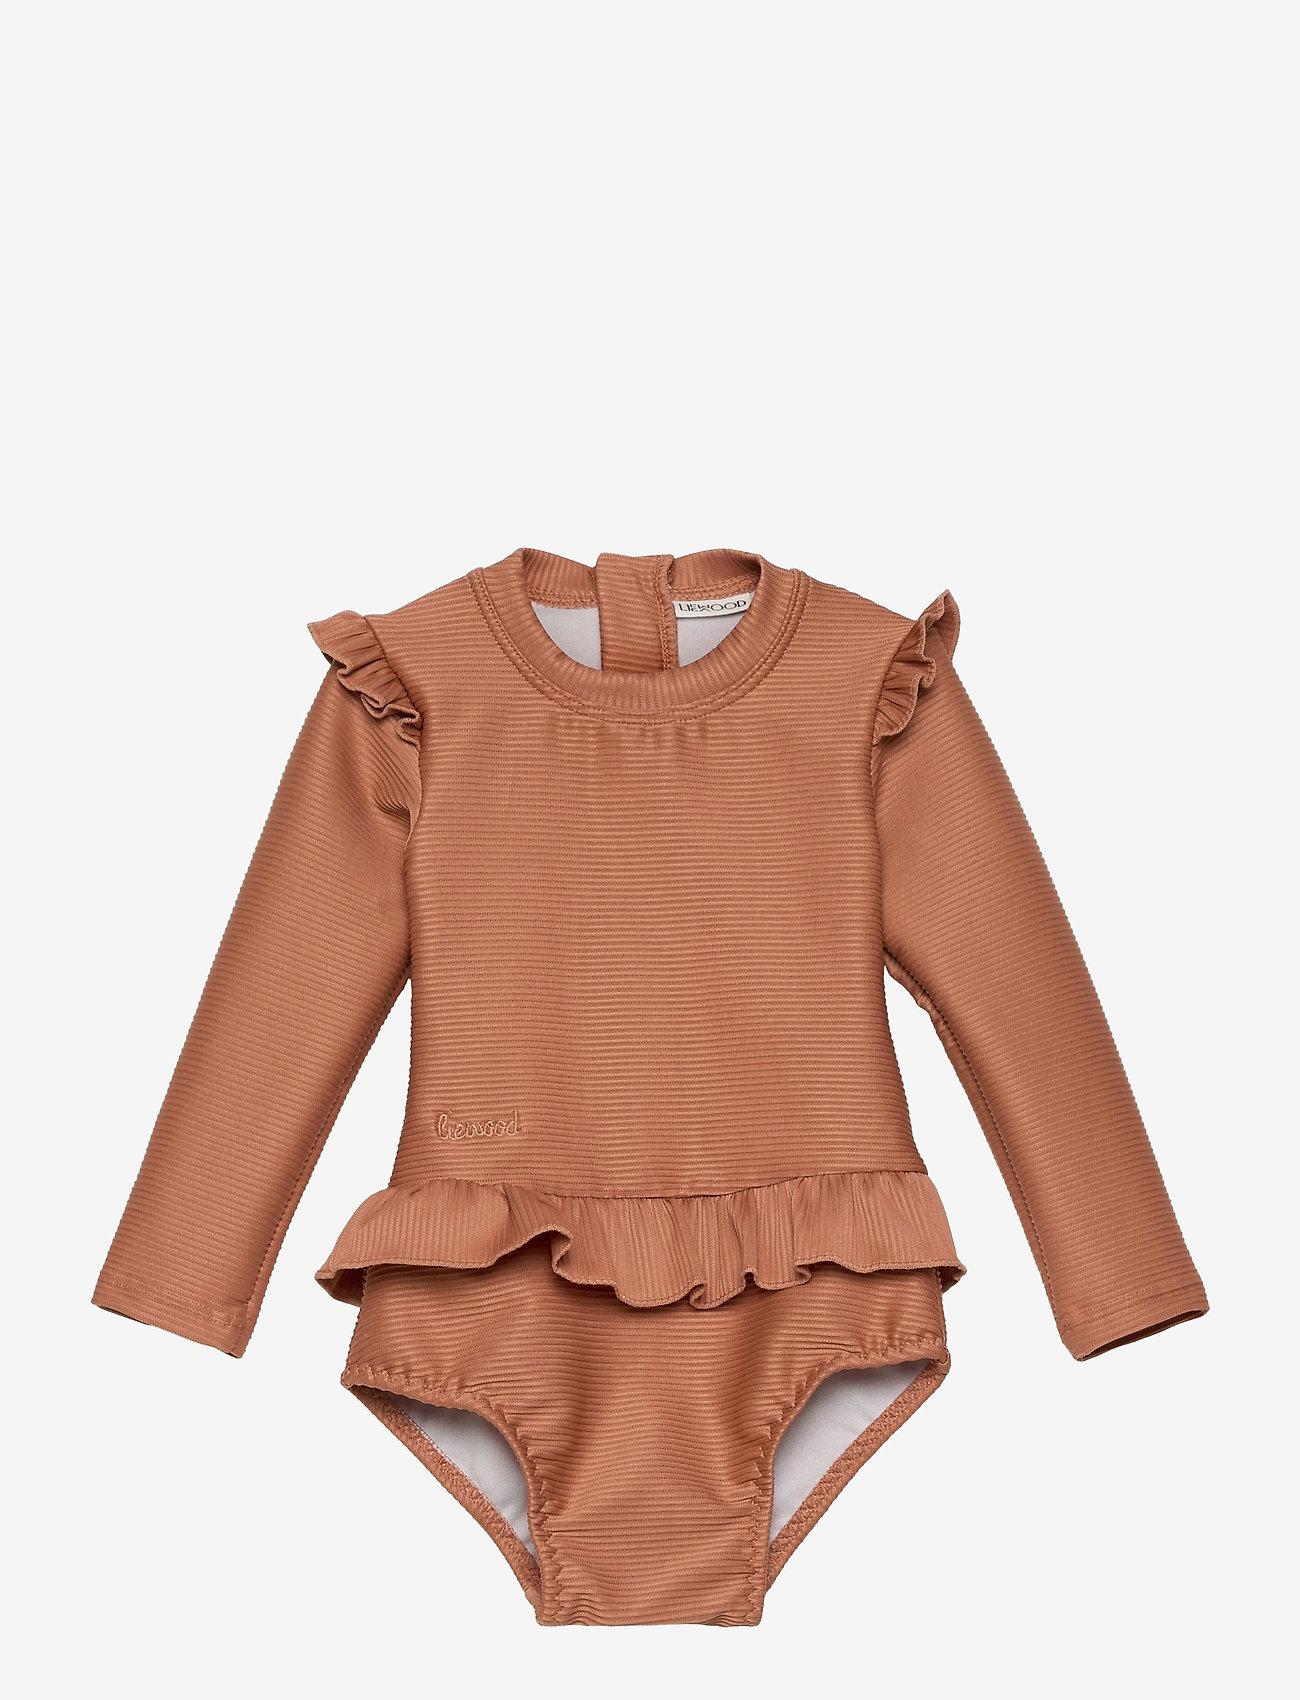 Liewood - Sille swim jumpsuit structure - uv-clothing - tuscany rose - 0